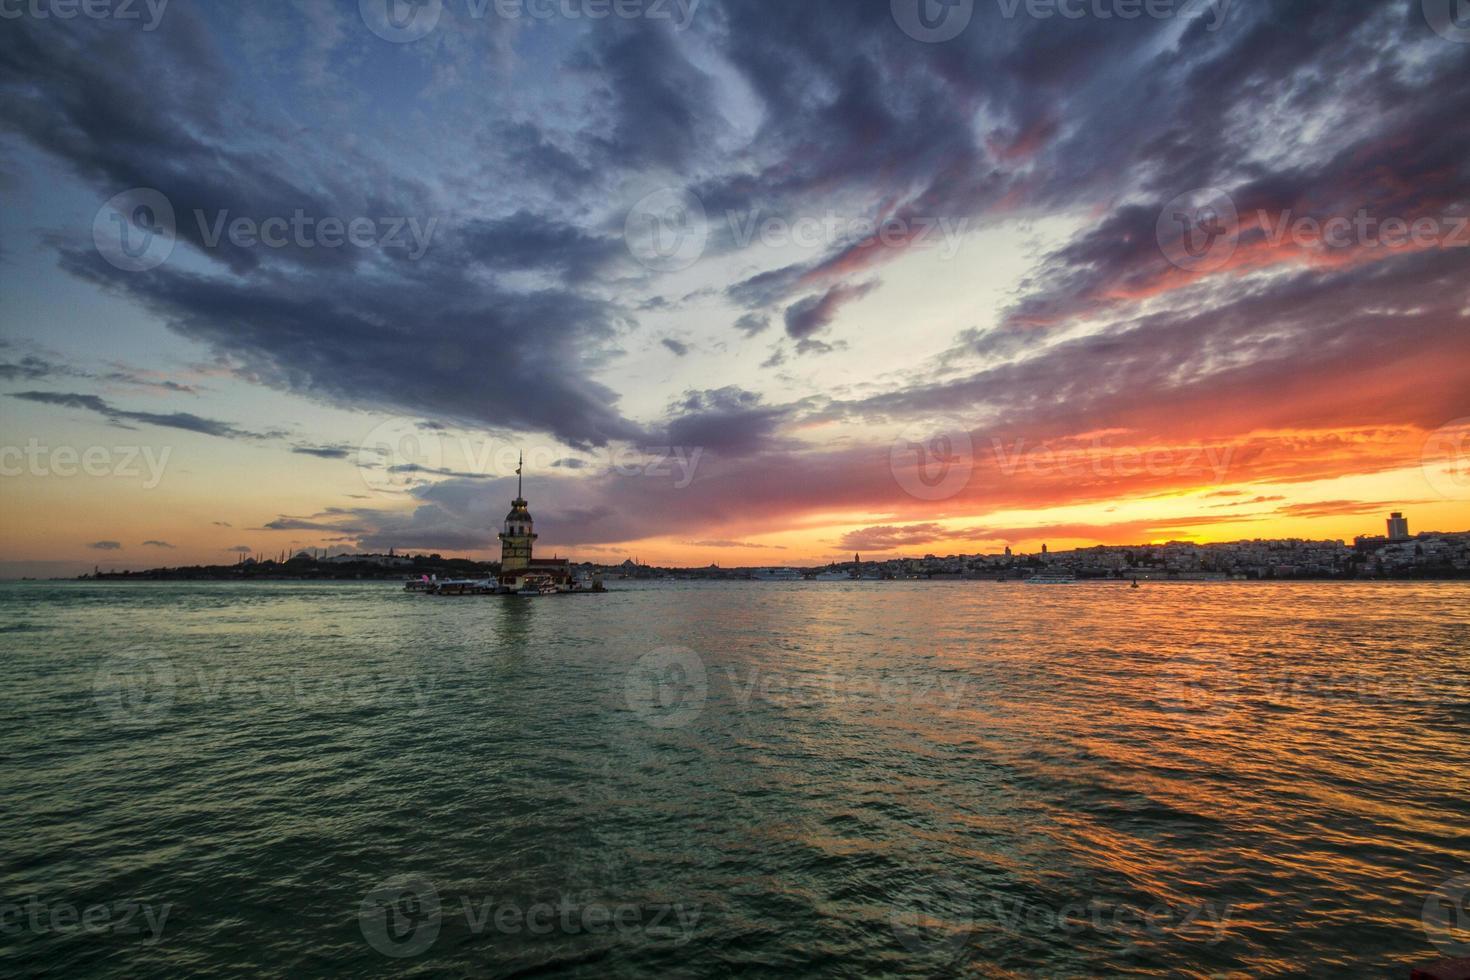 torre da donzela em Istambul, Turquia foto